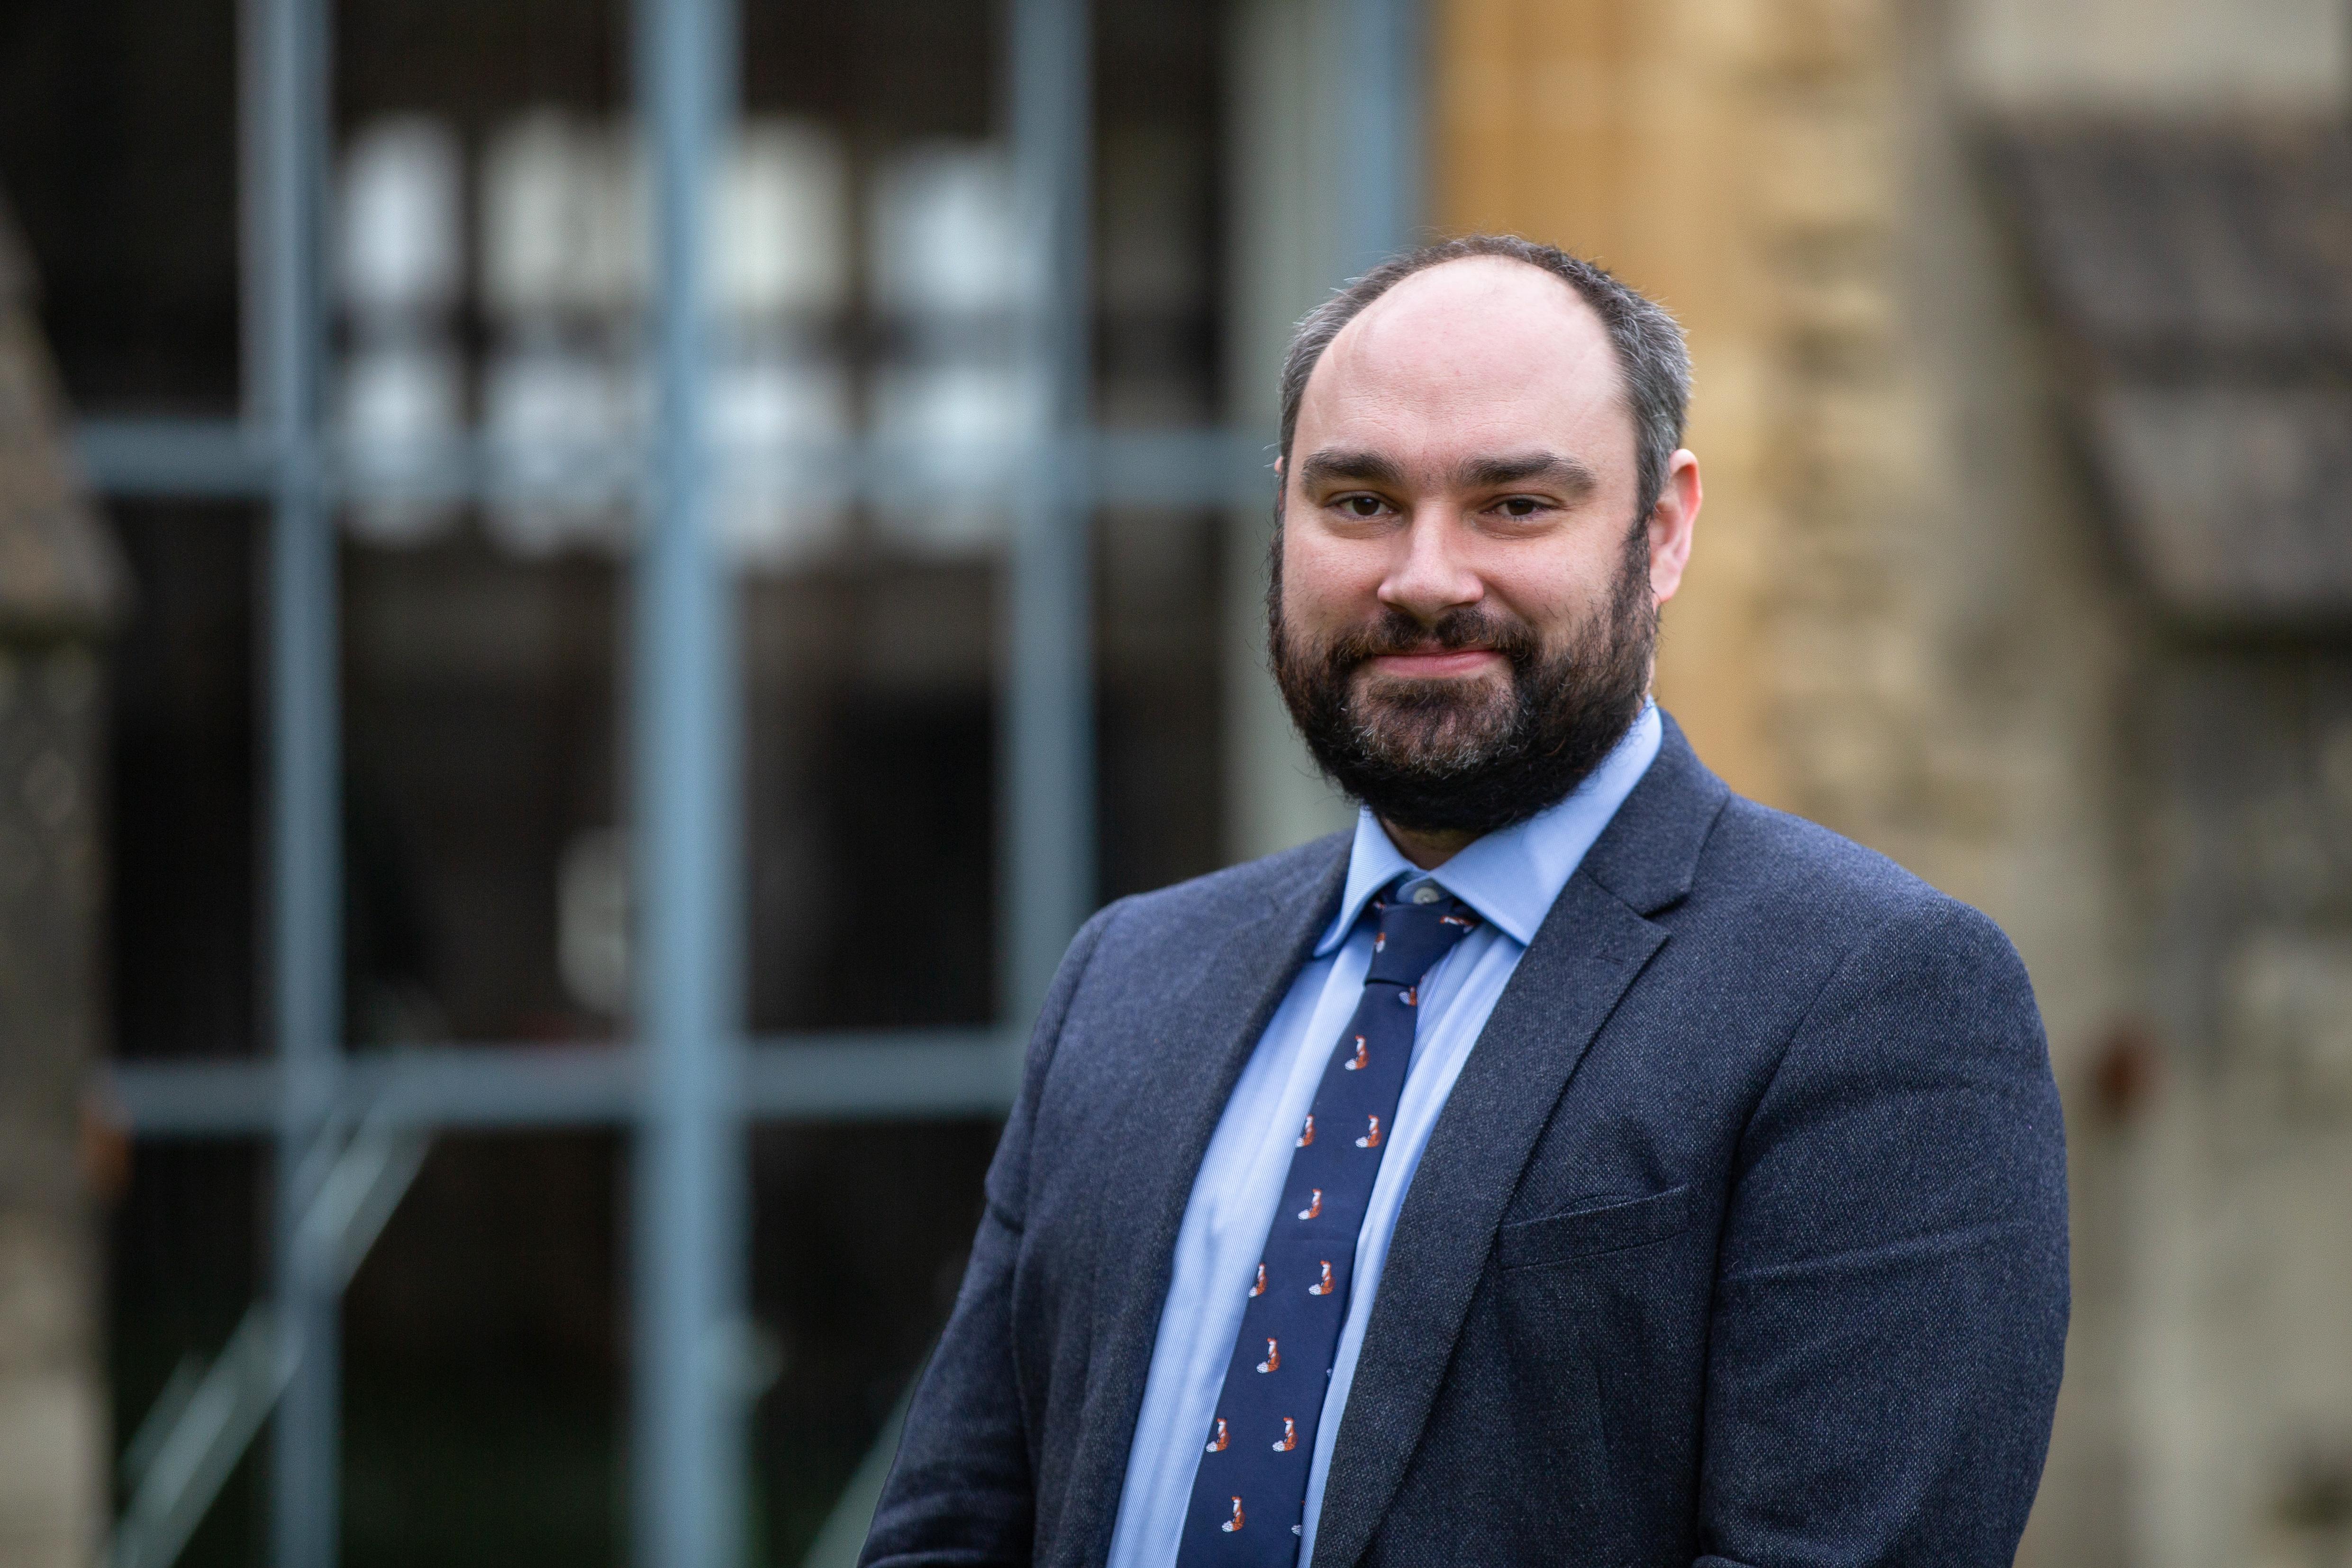 Ben Forward-Davies head of religious studies and philosophy at Cheltenham Ladies' College